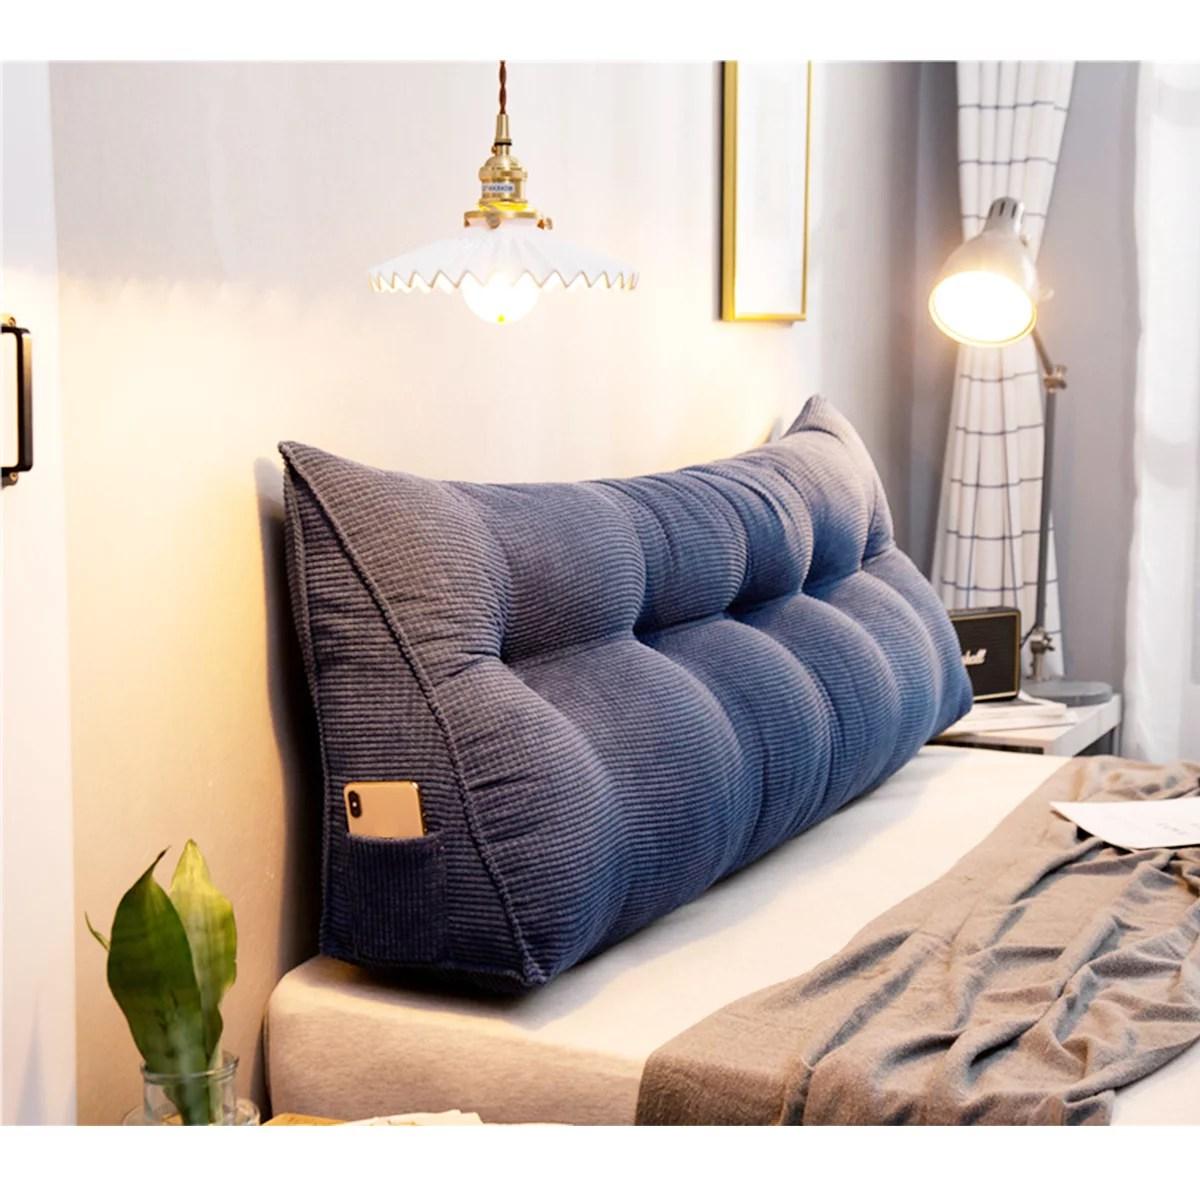 39 47 59 multi color large soft triangular wedge pillow bedside pillow lumbar pad pillow bed sofa reading pillow for bedroom living room walmart com walmart com